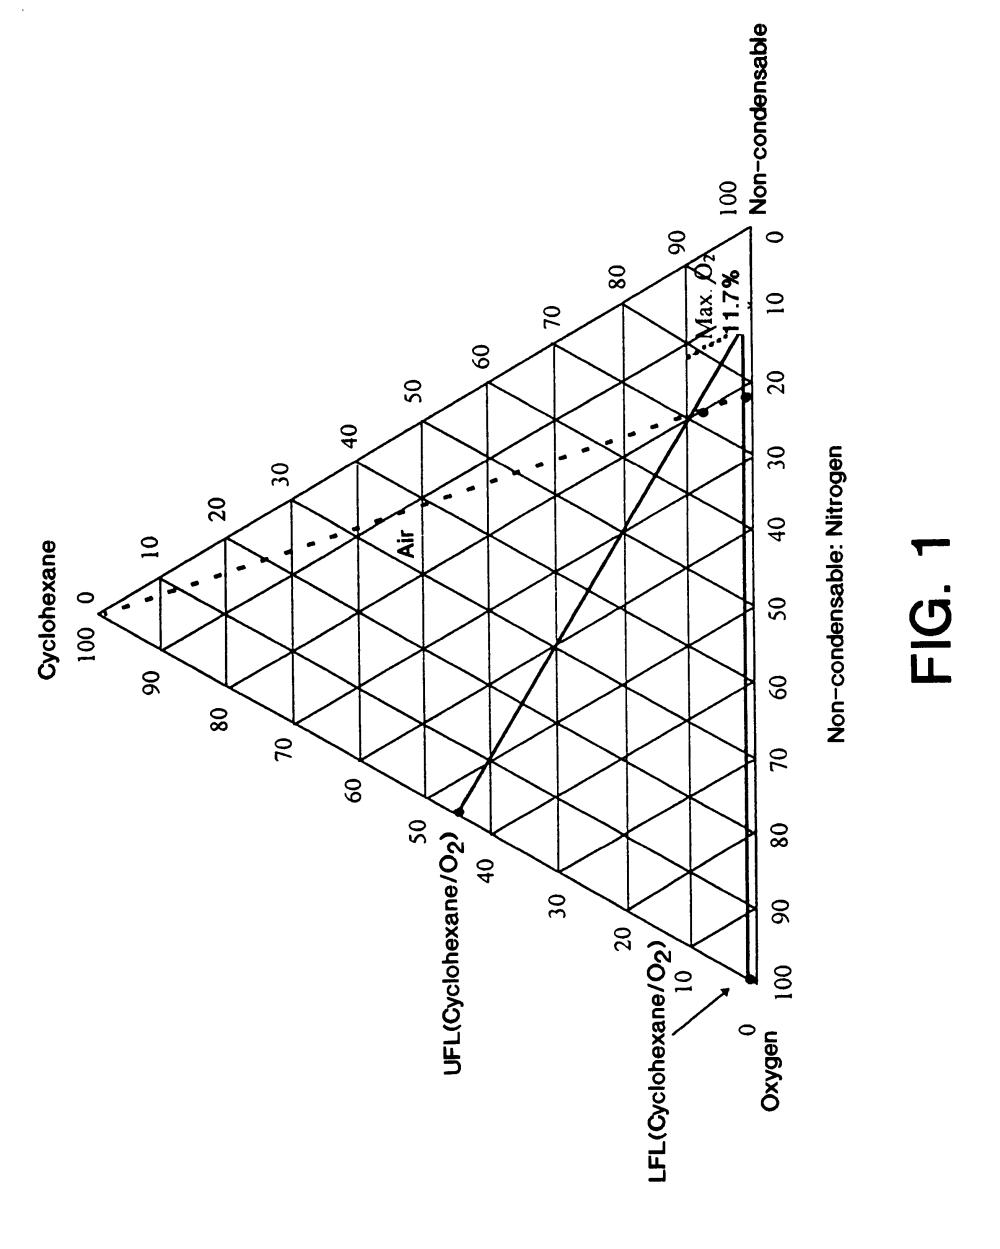 medium resolution of patent us6215027 ballast gas use in liquid phase oxidation methane oxygen nitrogen flammability diagram flammability diagram make up